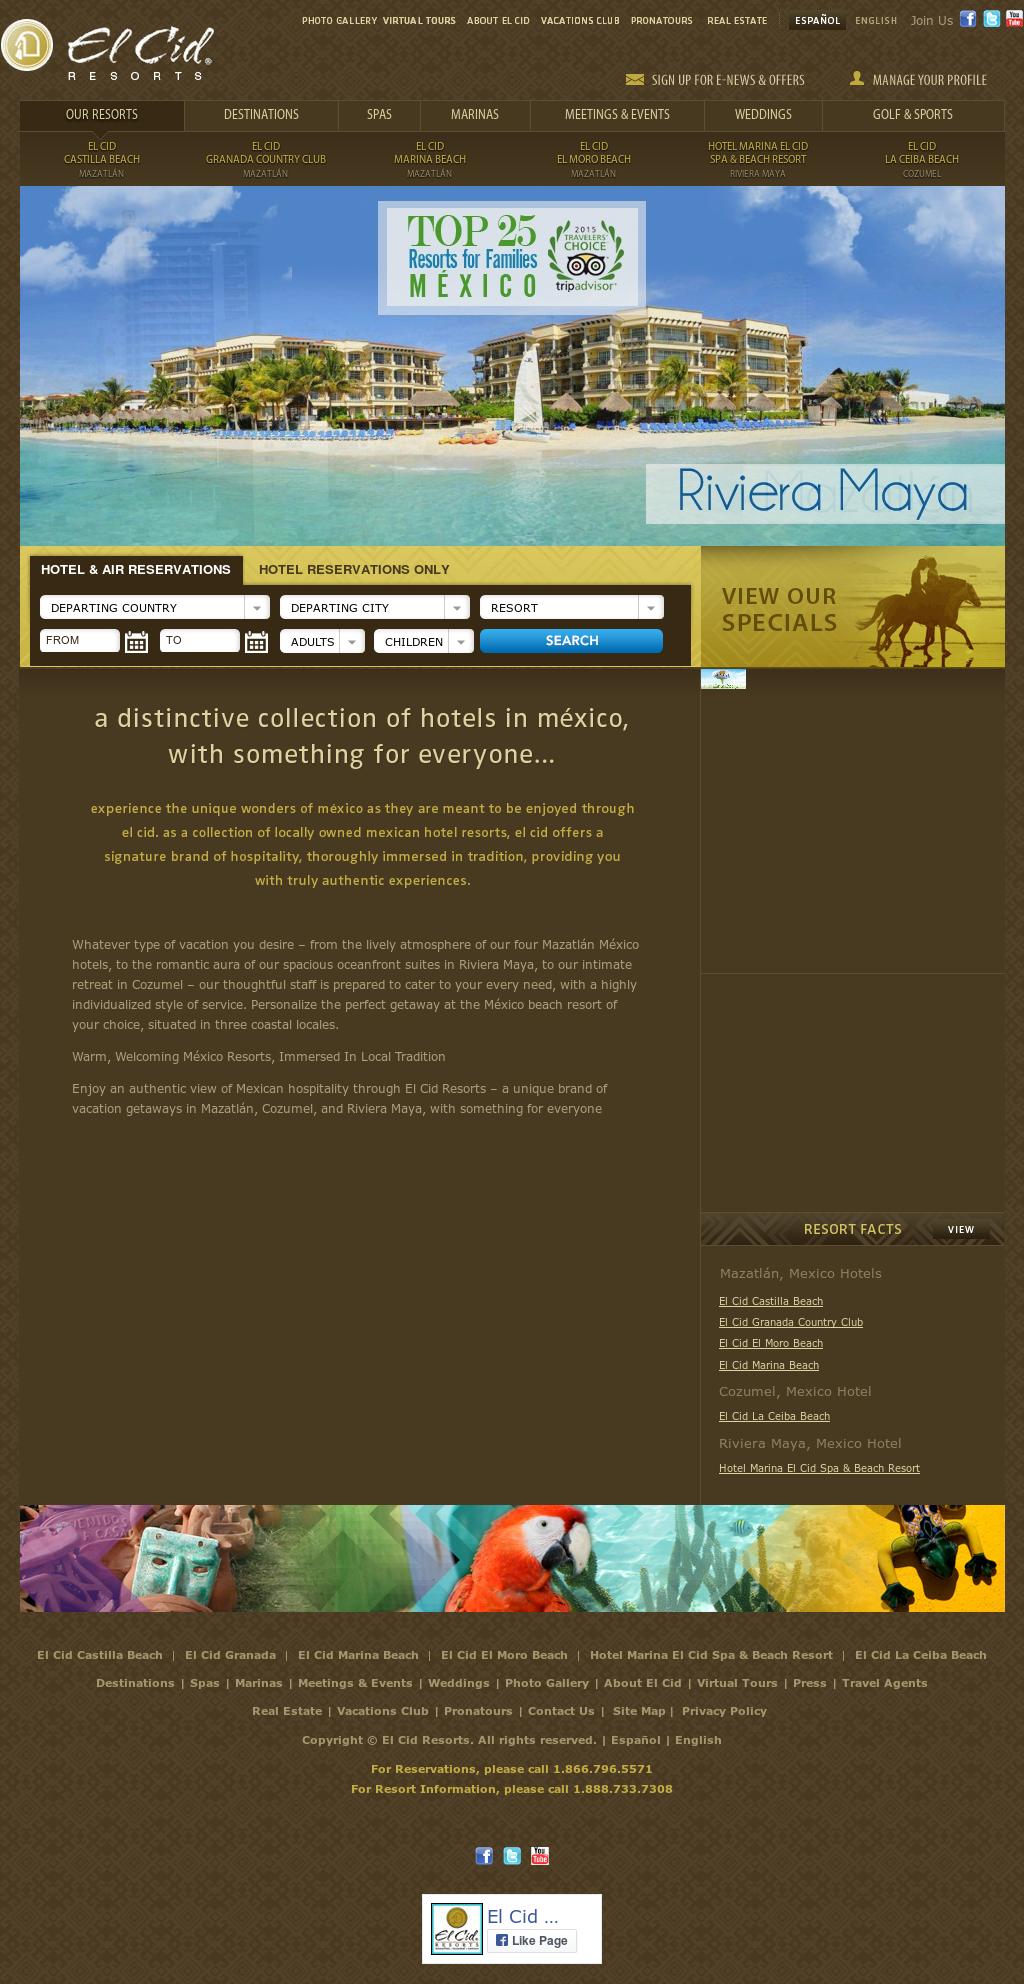 Owler Reports - El Cid Resorts: El Cid's New Event Hotel to Open in